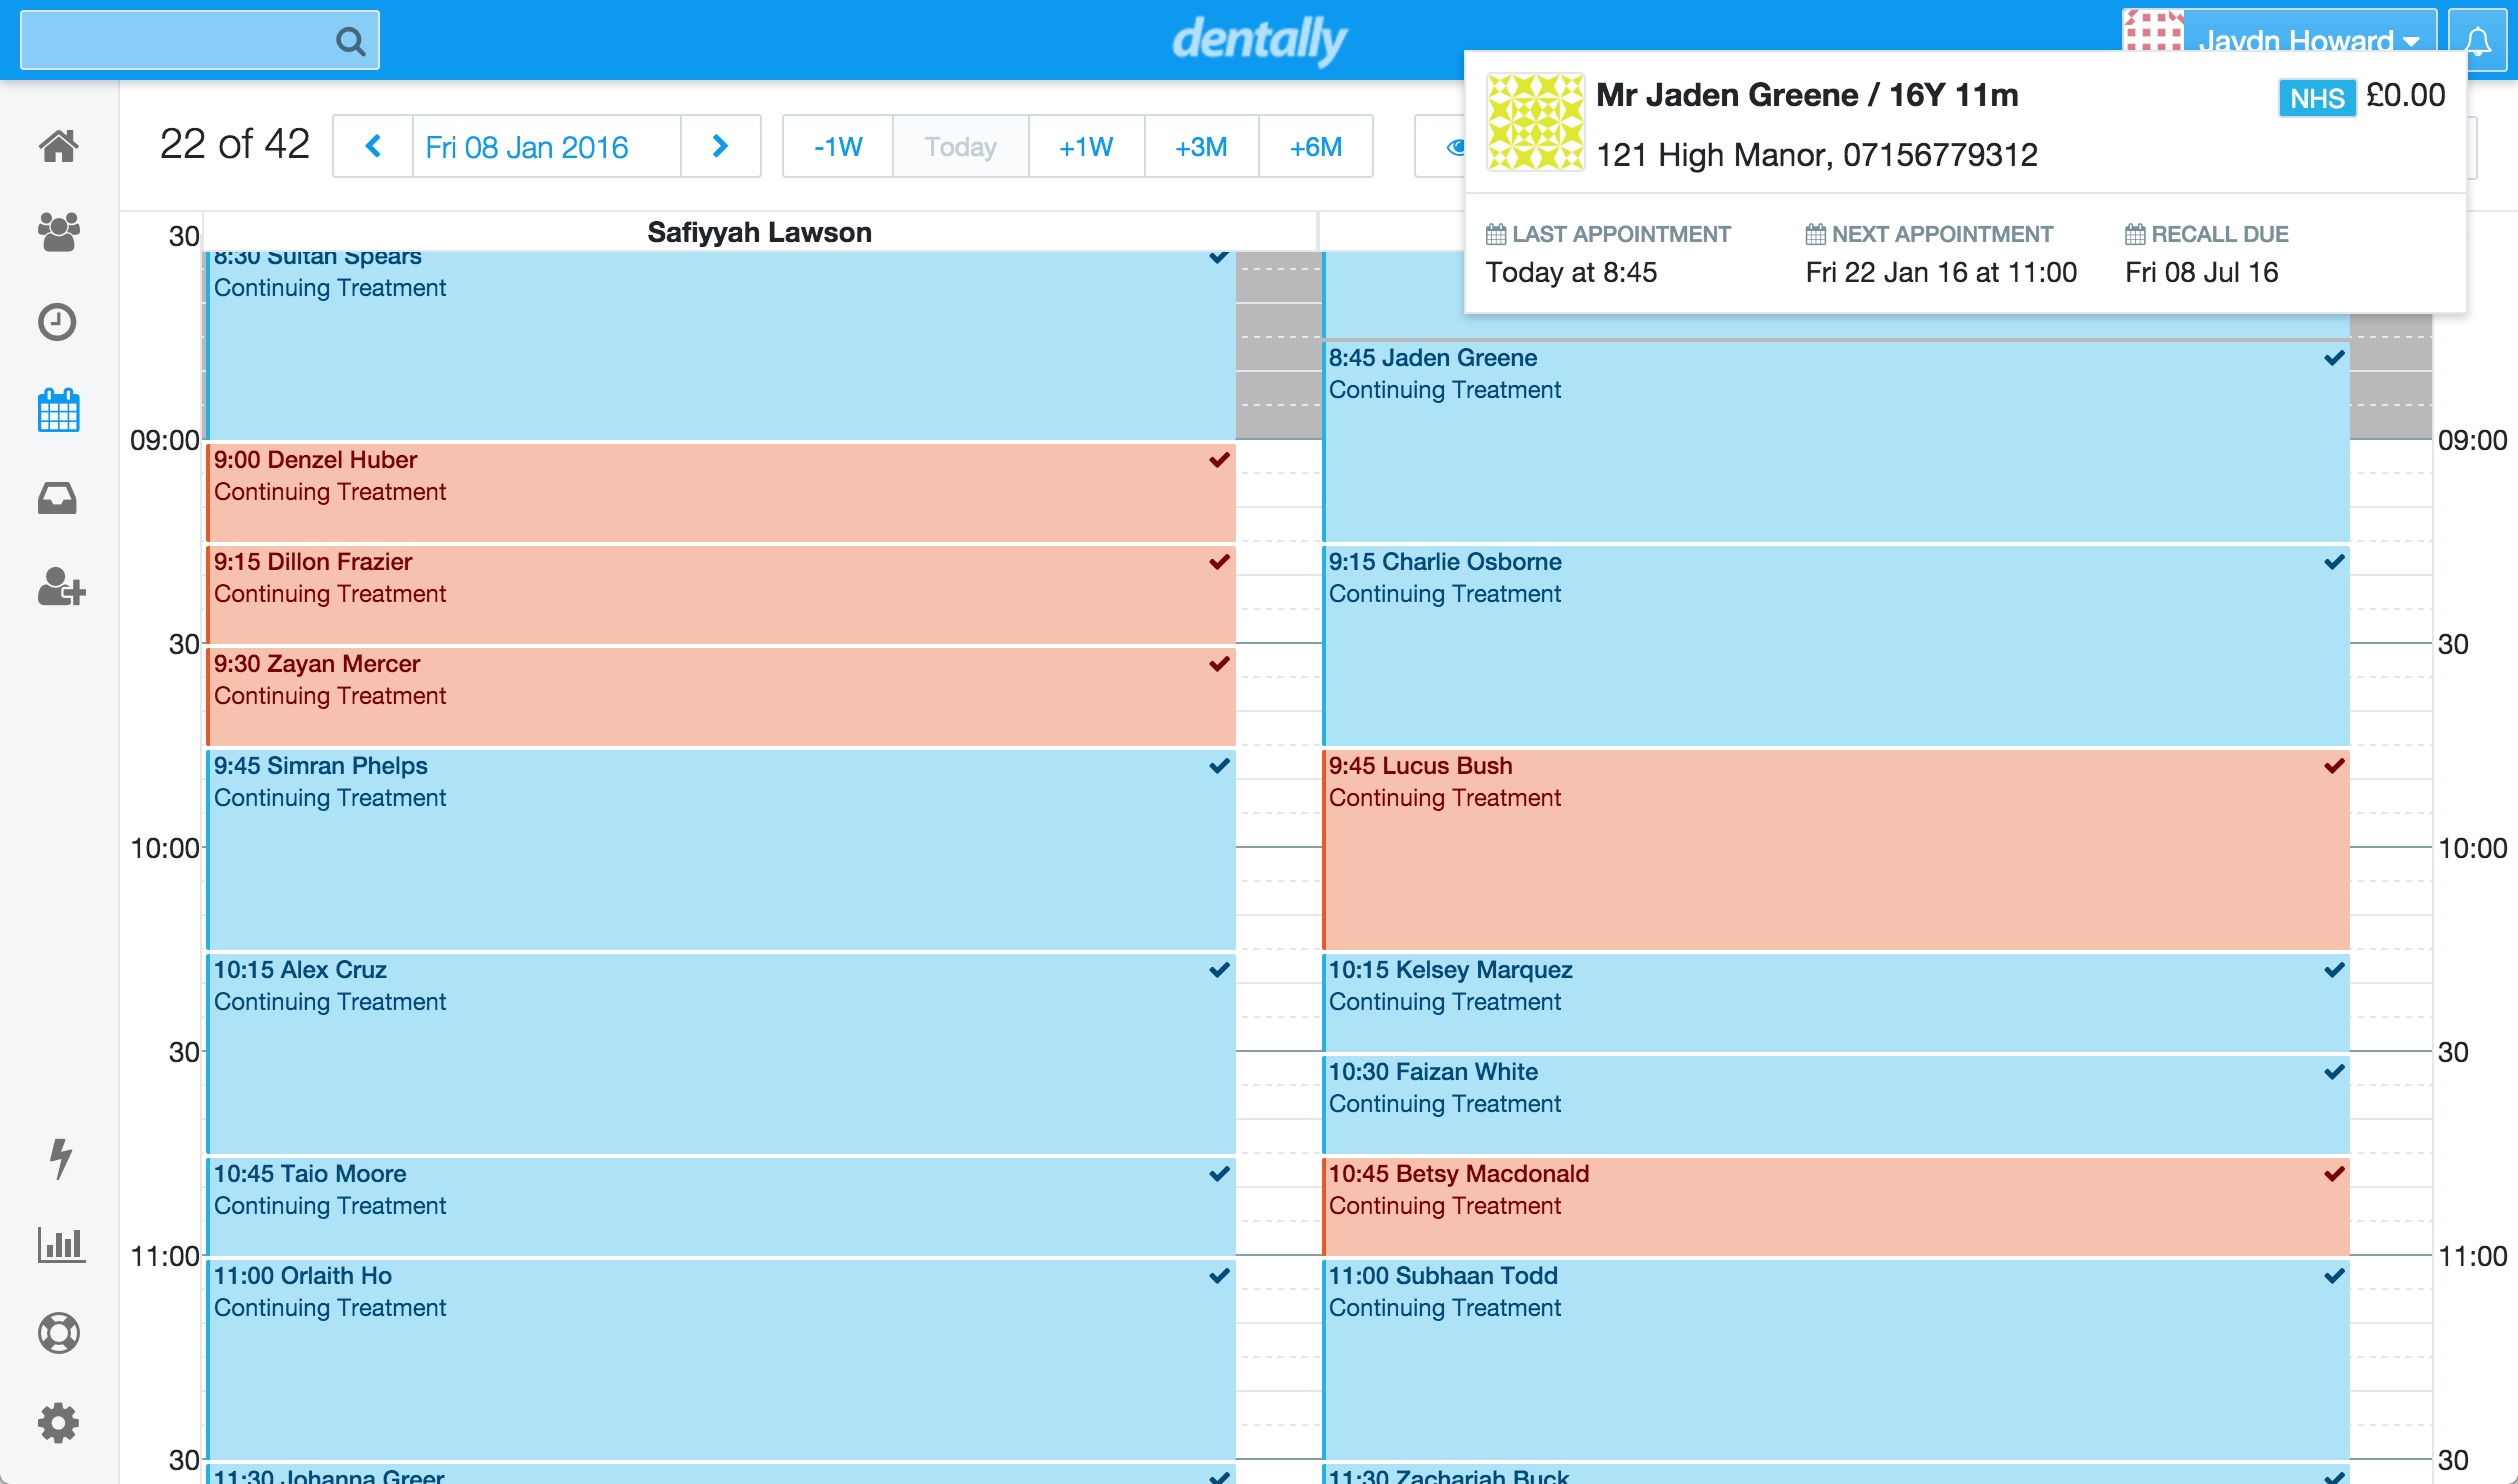 Calendar - Hover for Patient Details